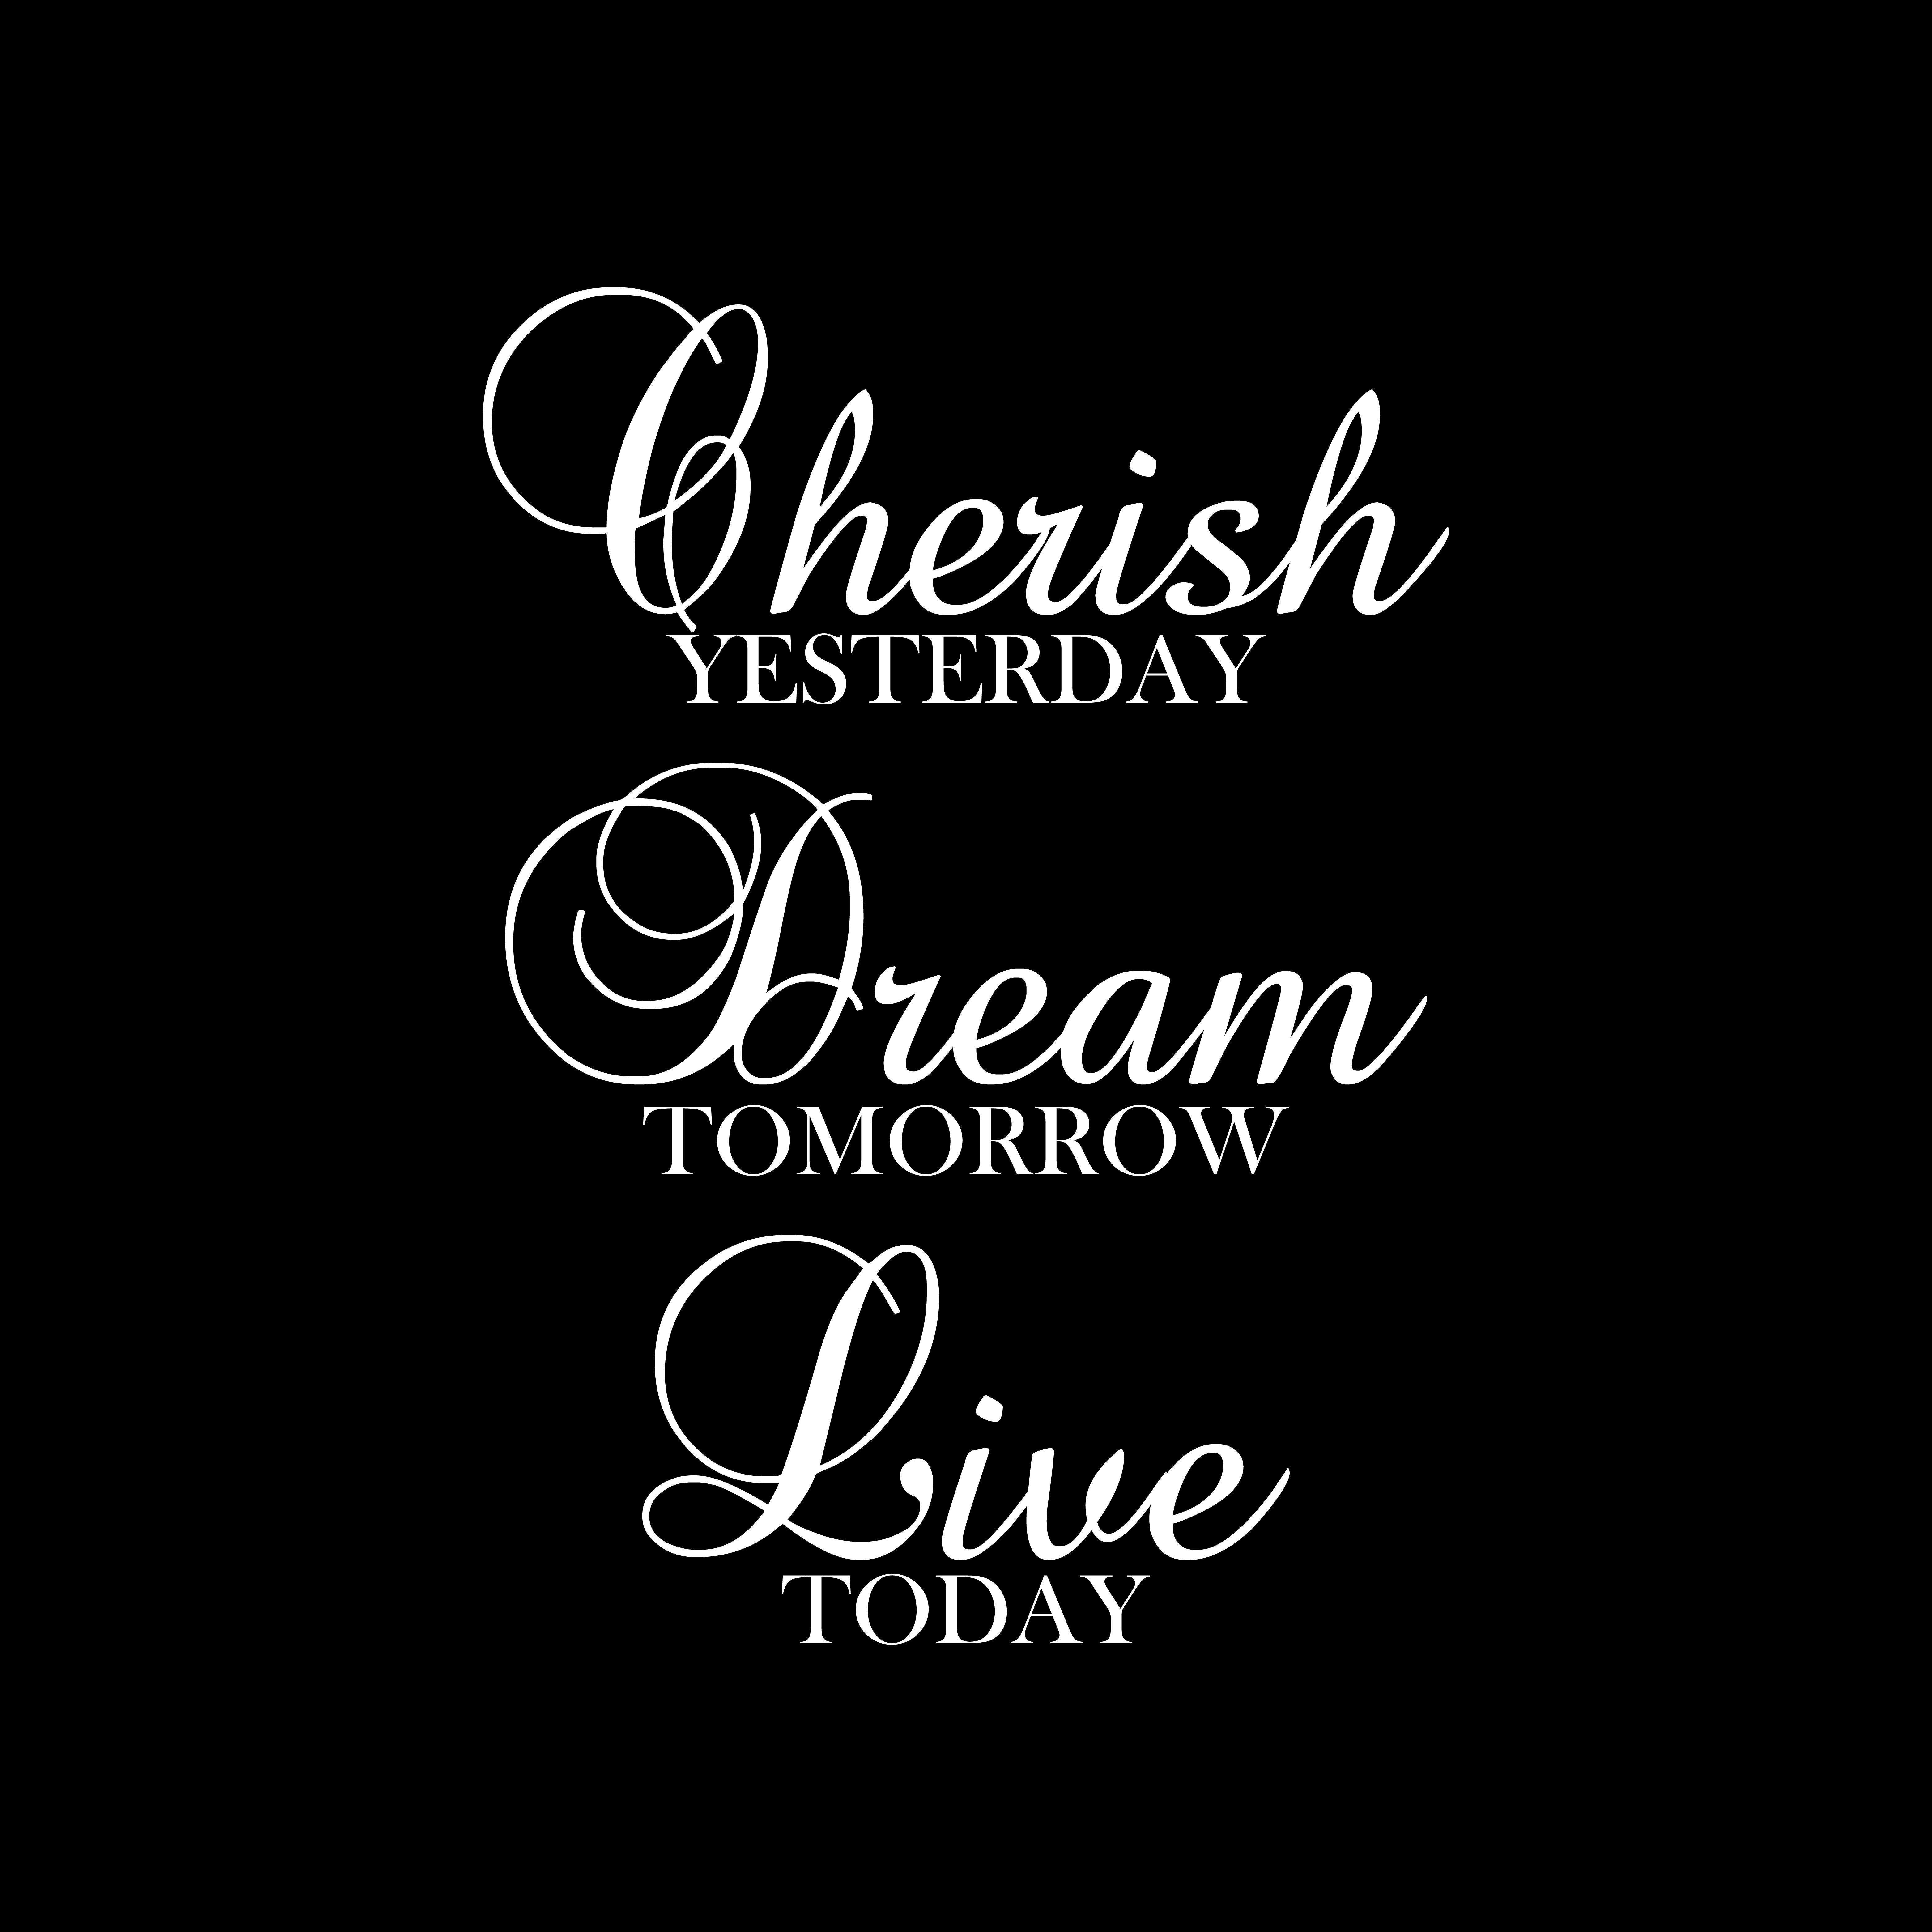 Cherish Yesterday Dream Tomorrow Live Today Inspirational